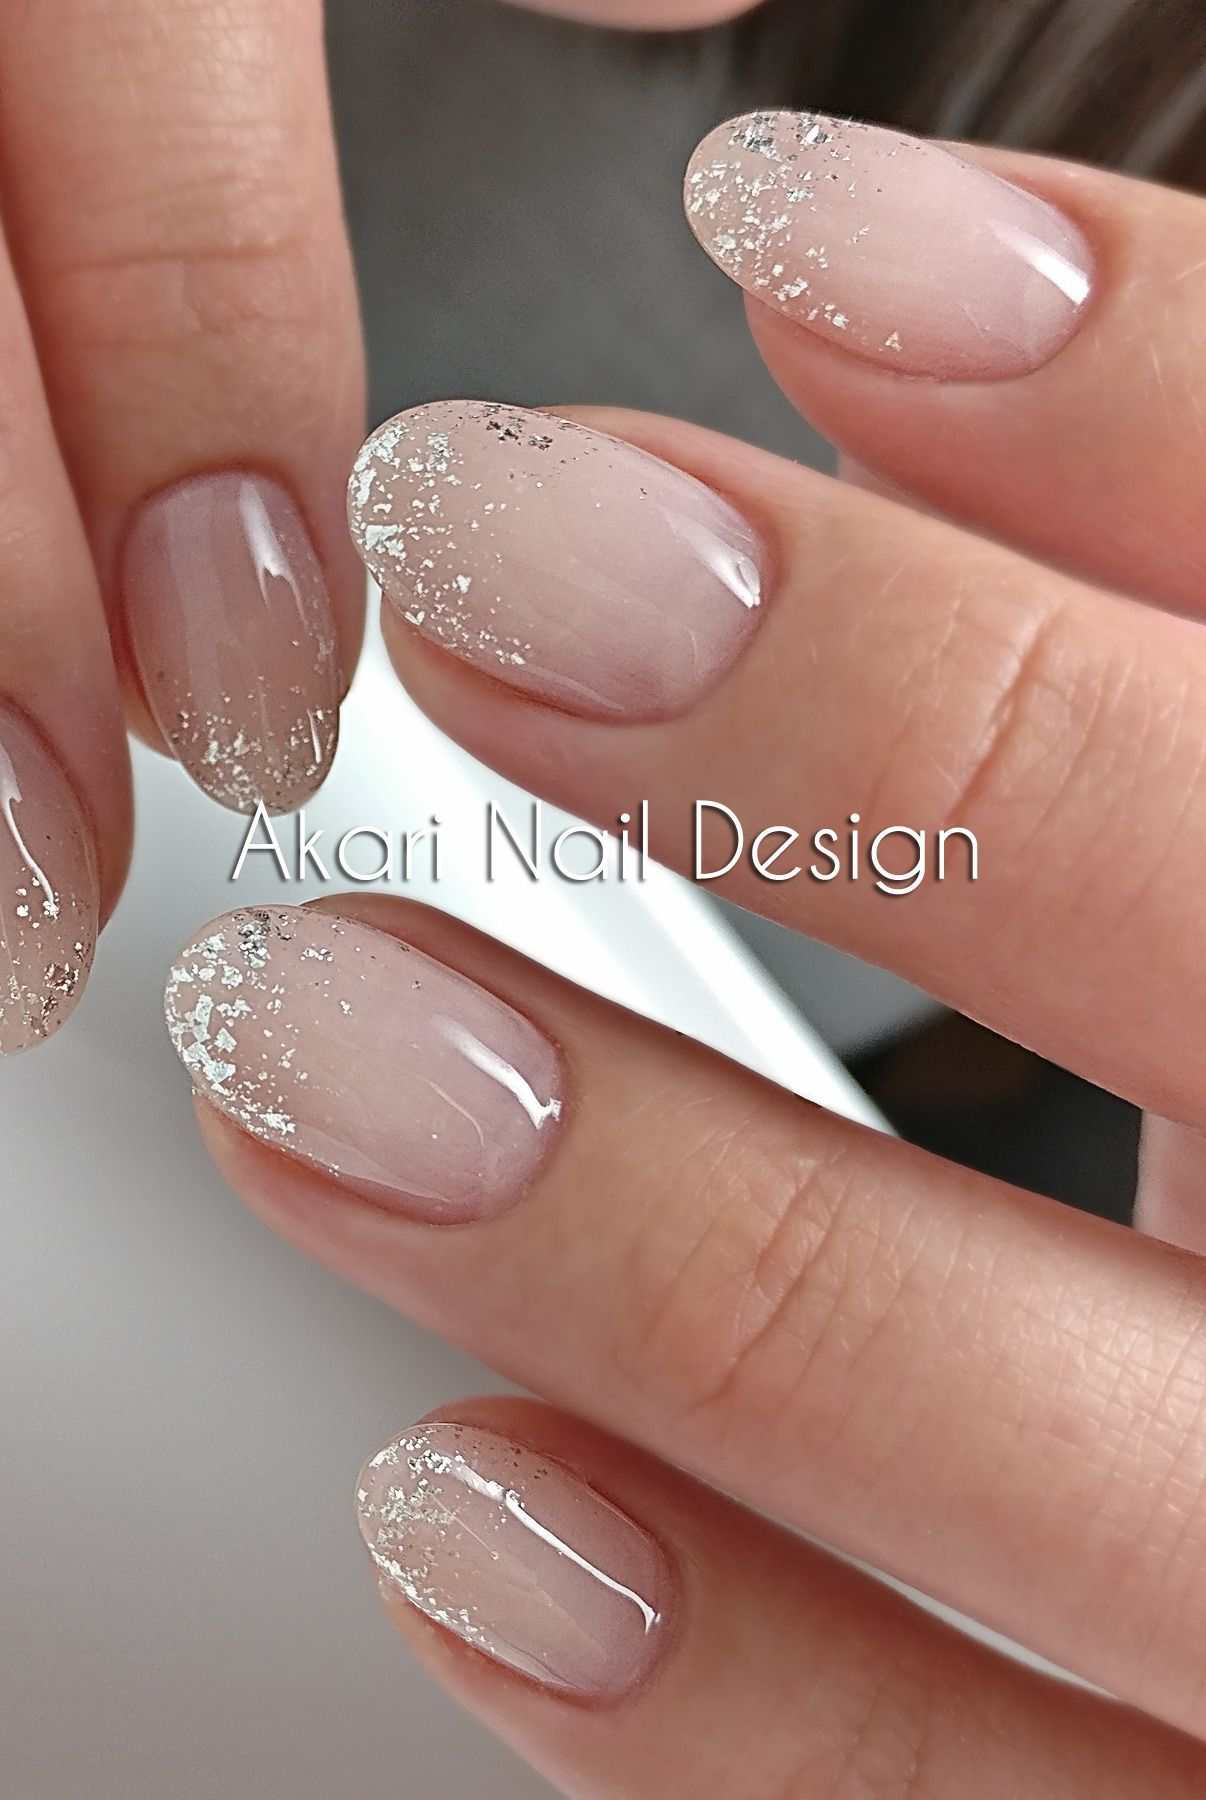 Akari Nail Design Photo Japanese Nail Artist In Vancouver Canada